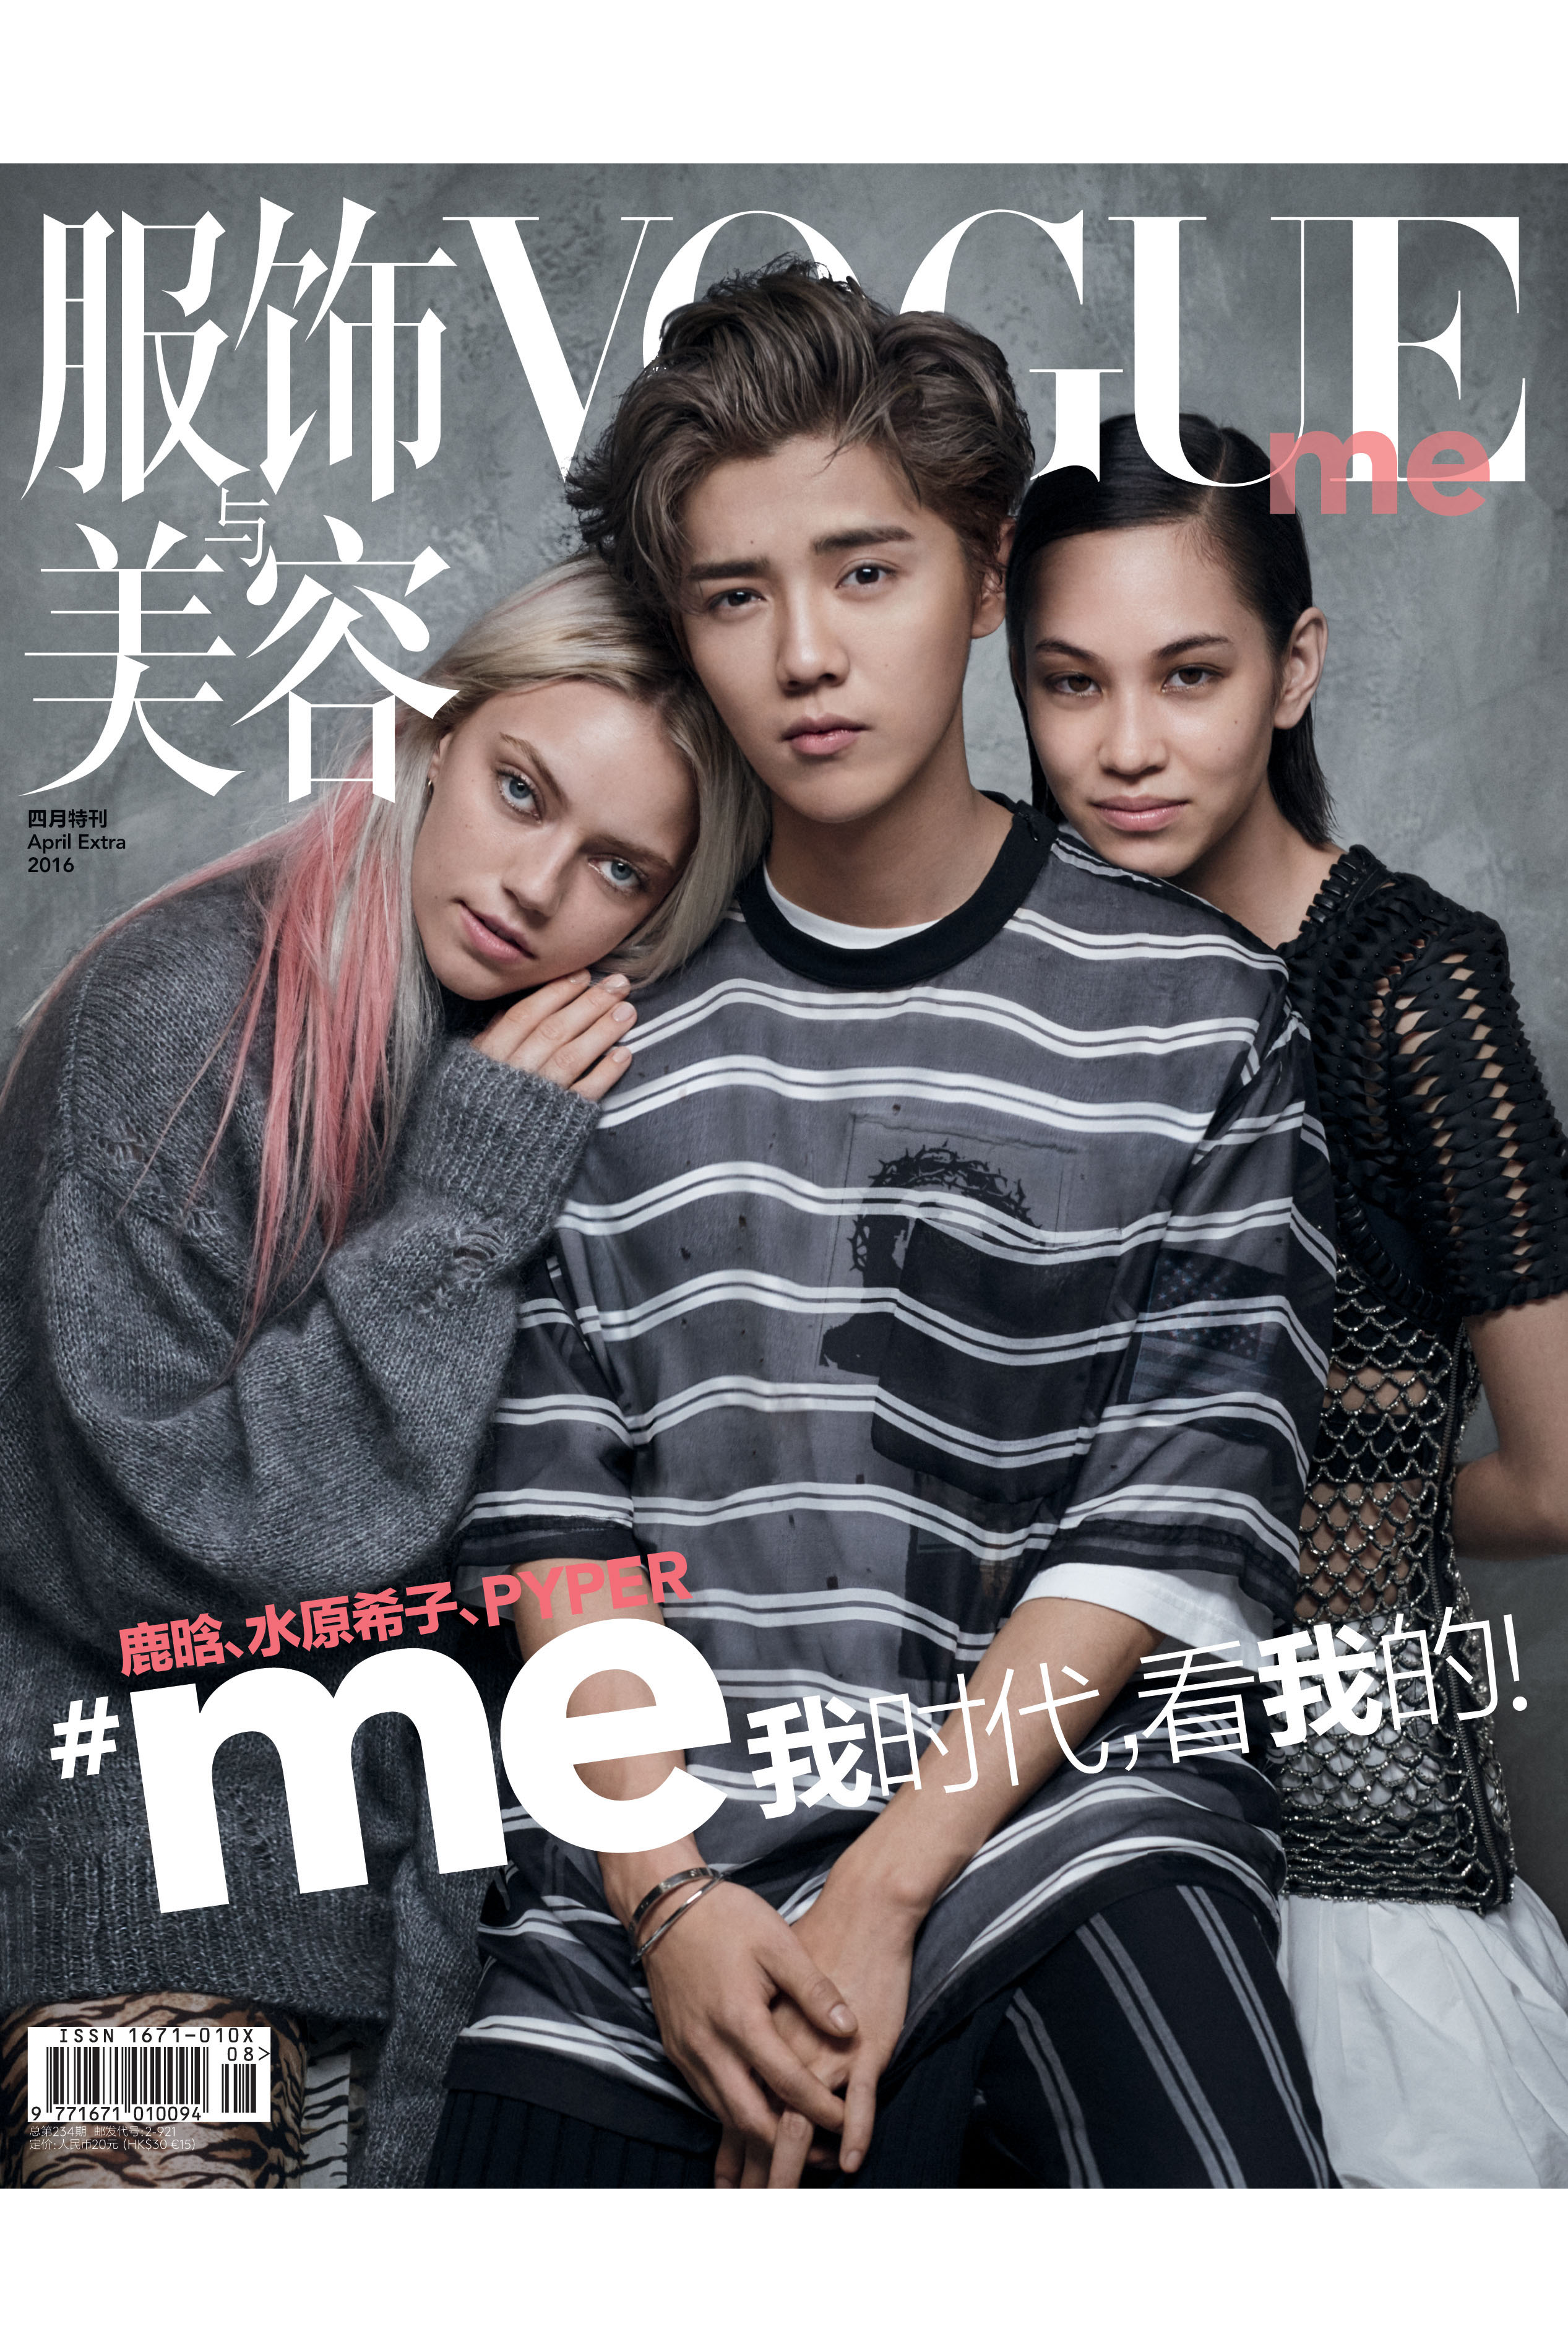 Cover For Vogue Me featuring Lu Han, Kiko Mizuhara & Pyper America Smith